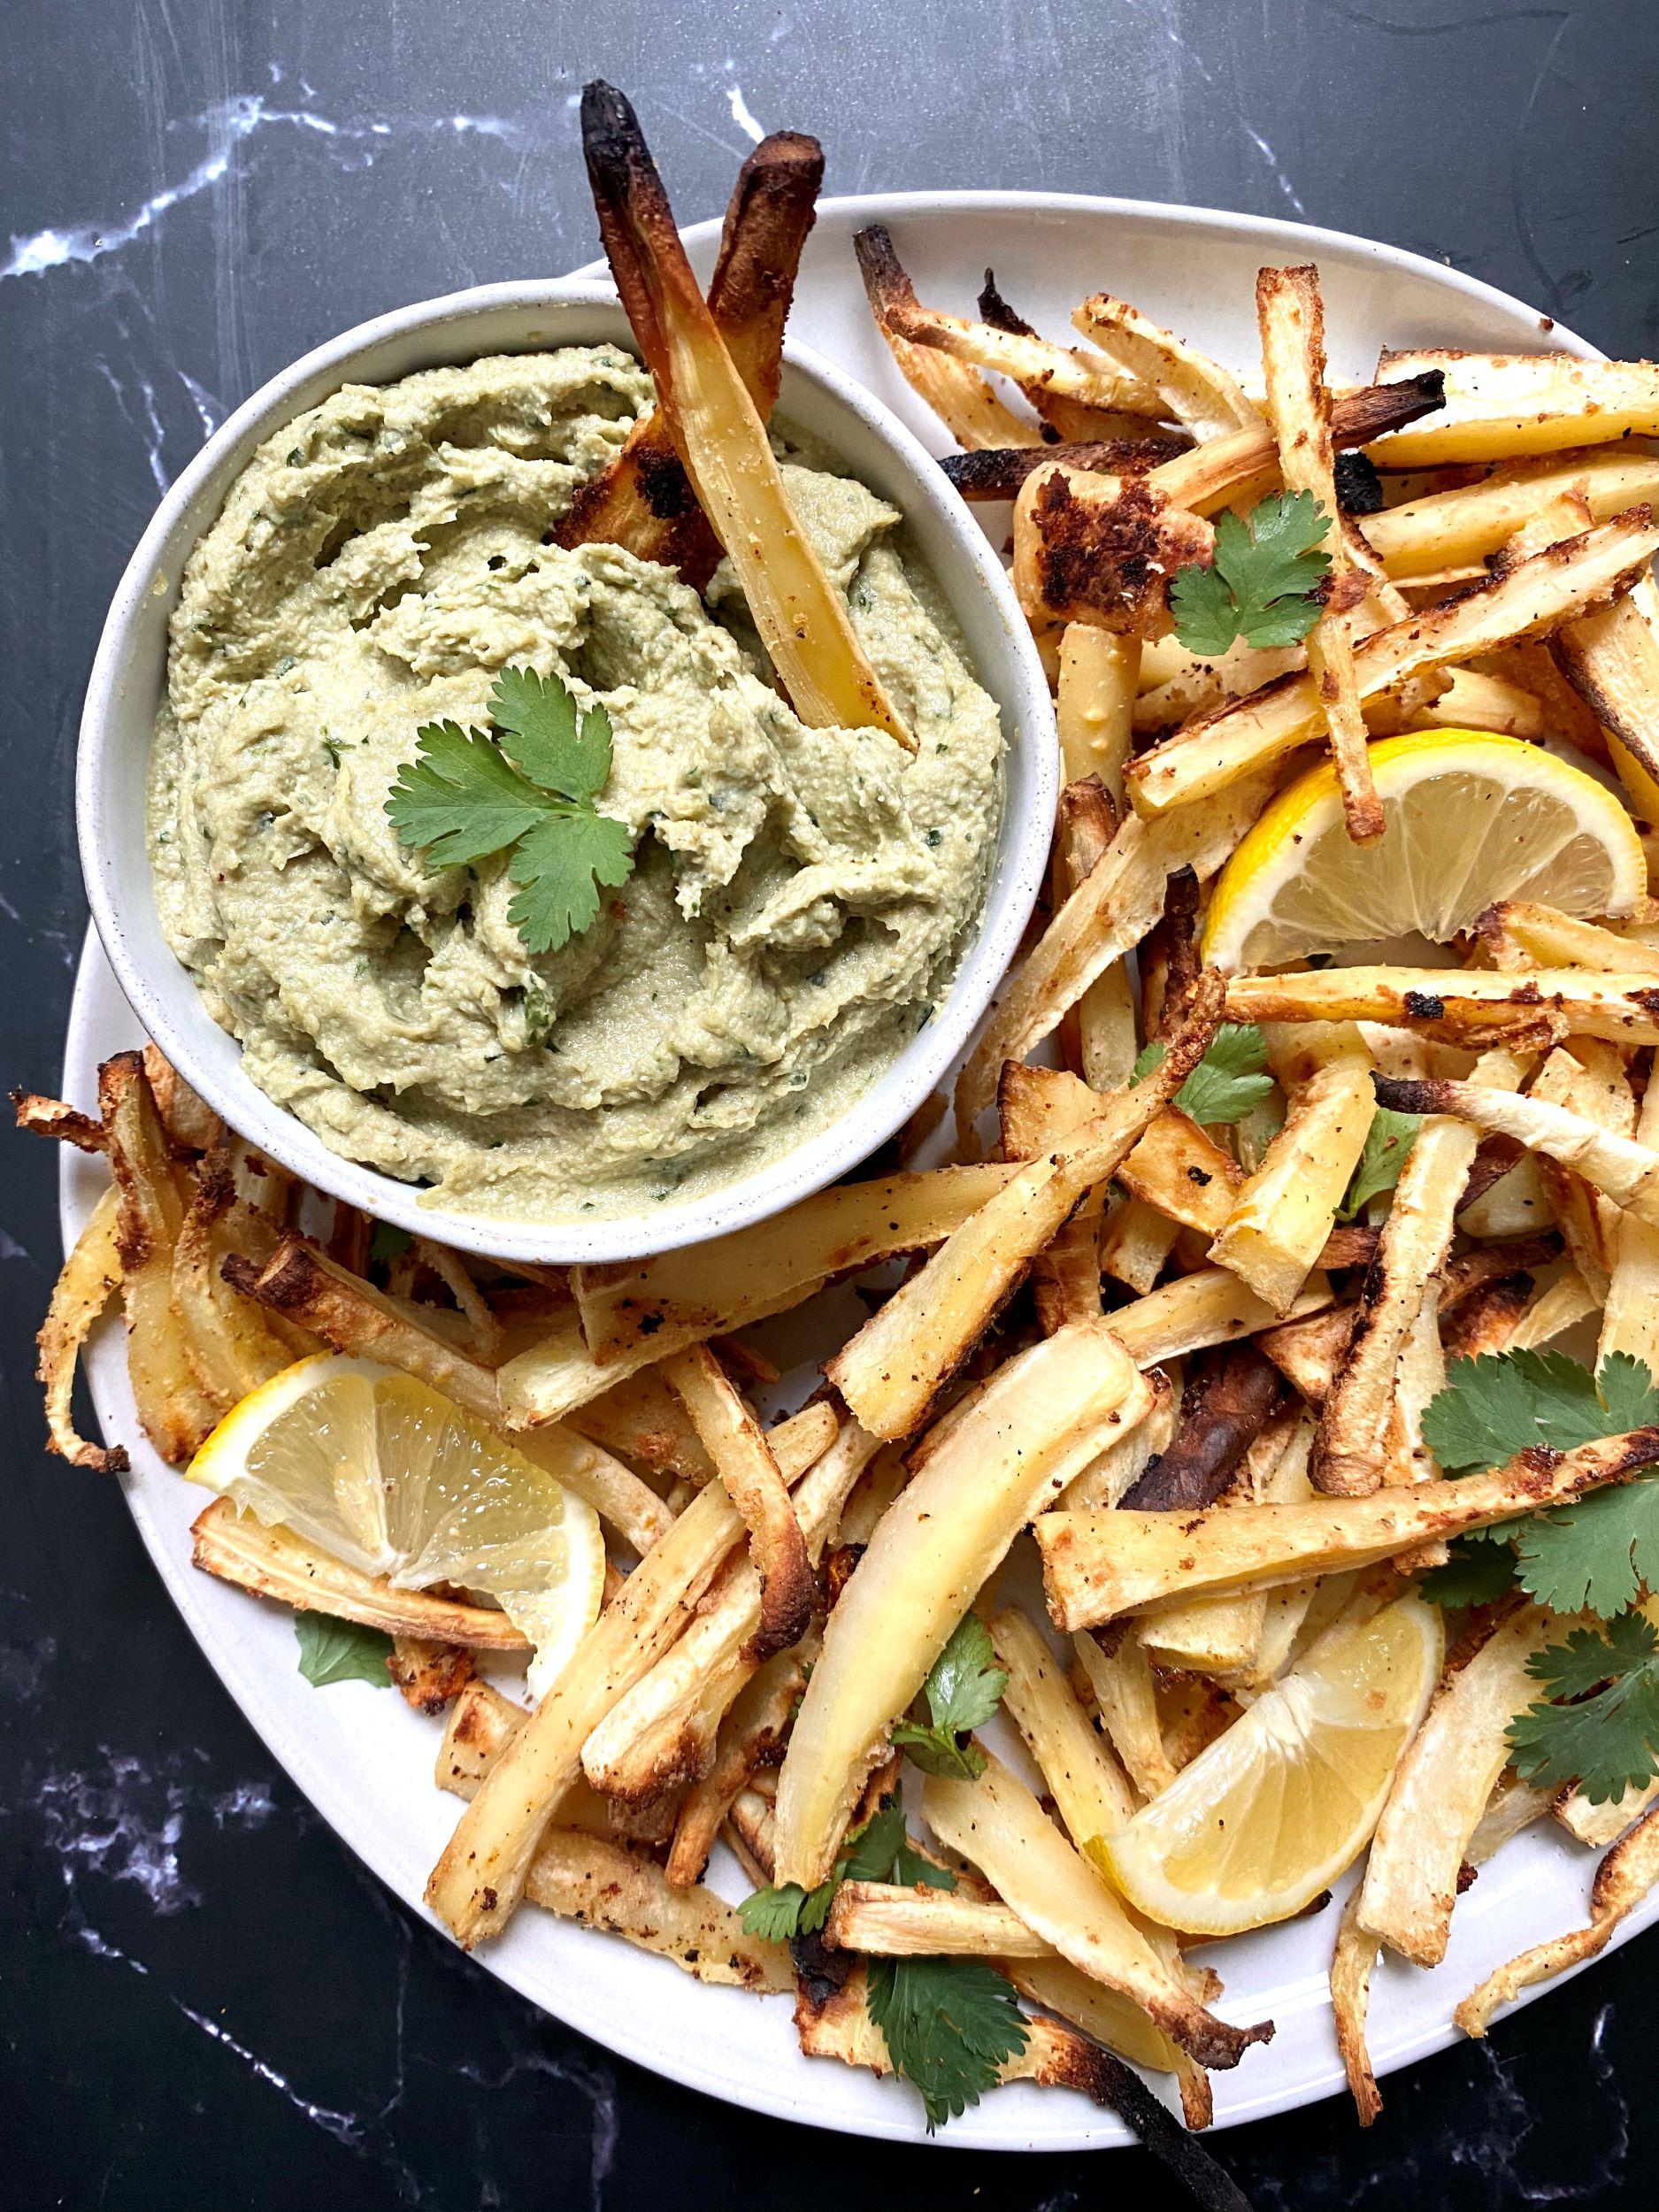 Garlic Parsnip Fries with Creamy Vegan Avocado Dip